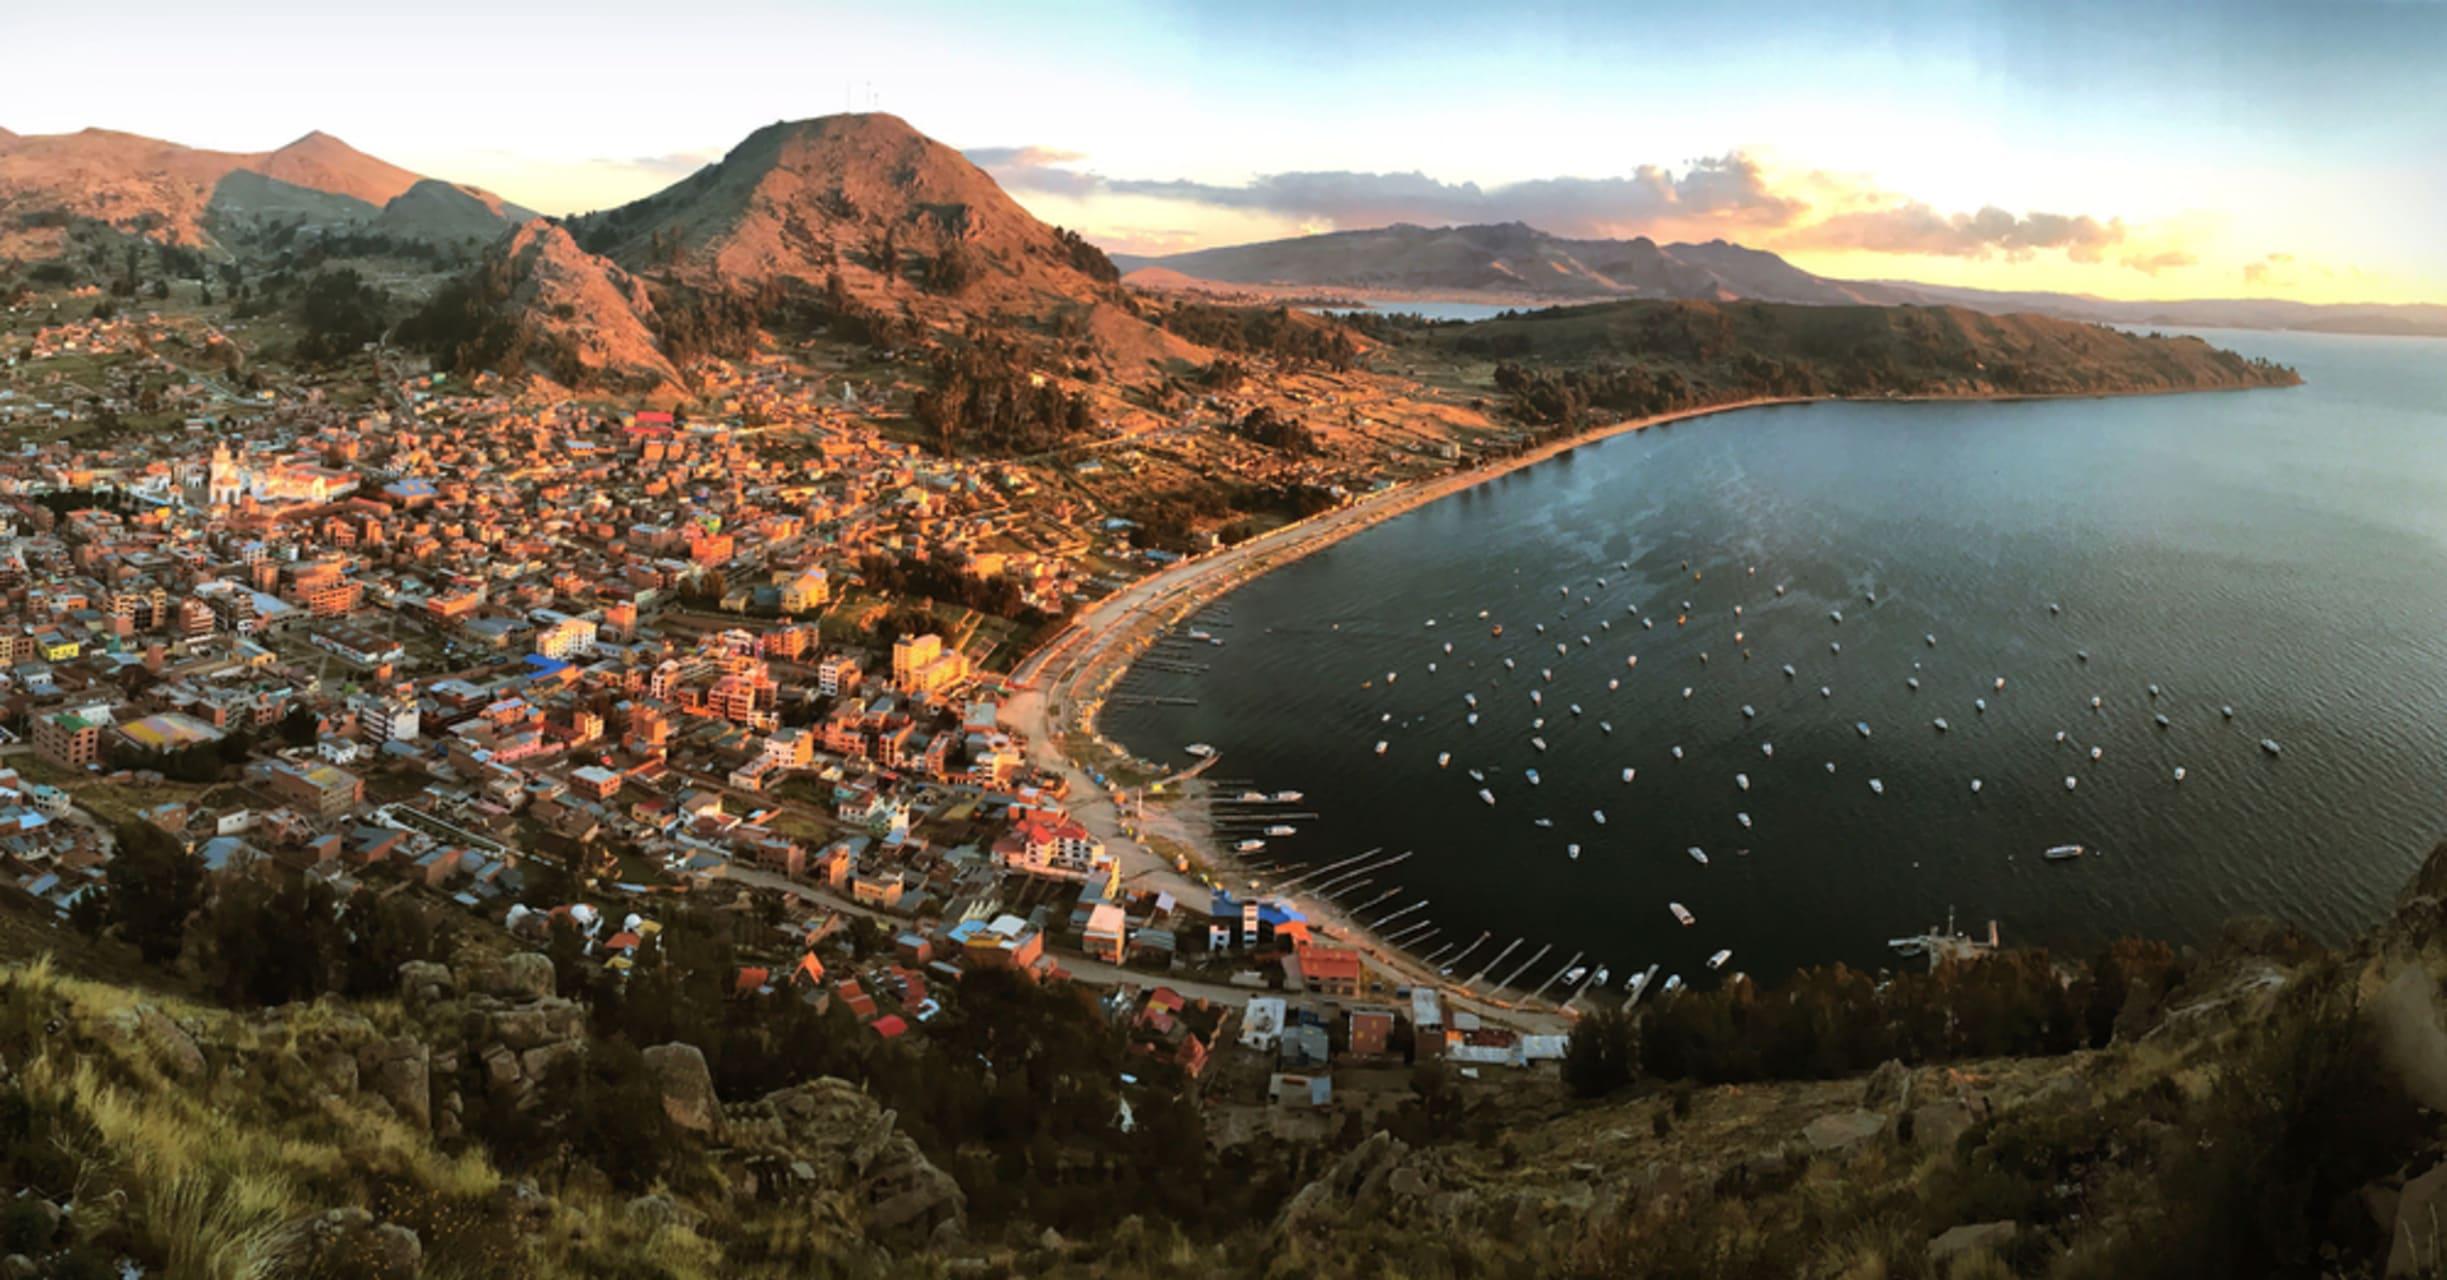 Lake Titicaca - Bolivia - Copacabana - The One in Bolivia